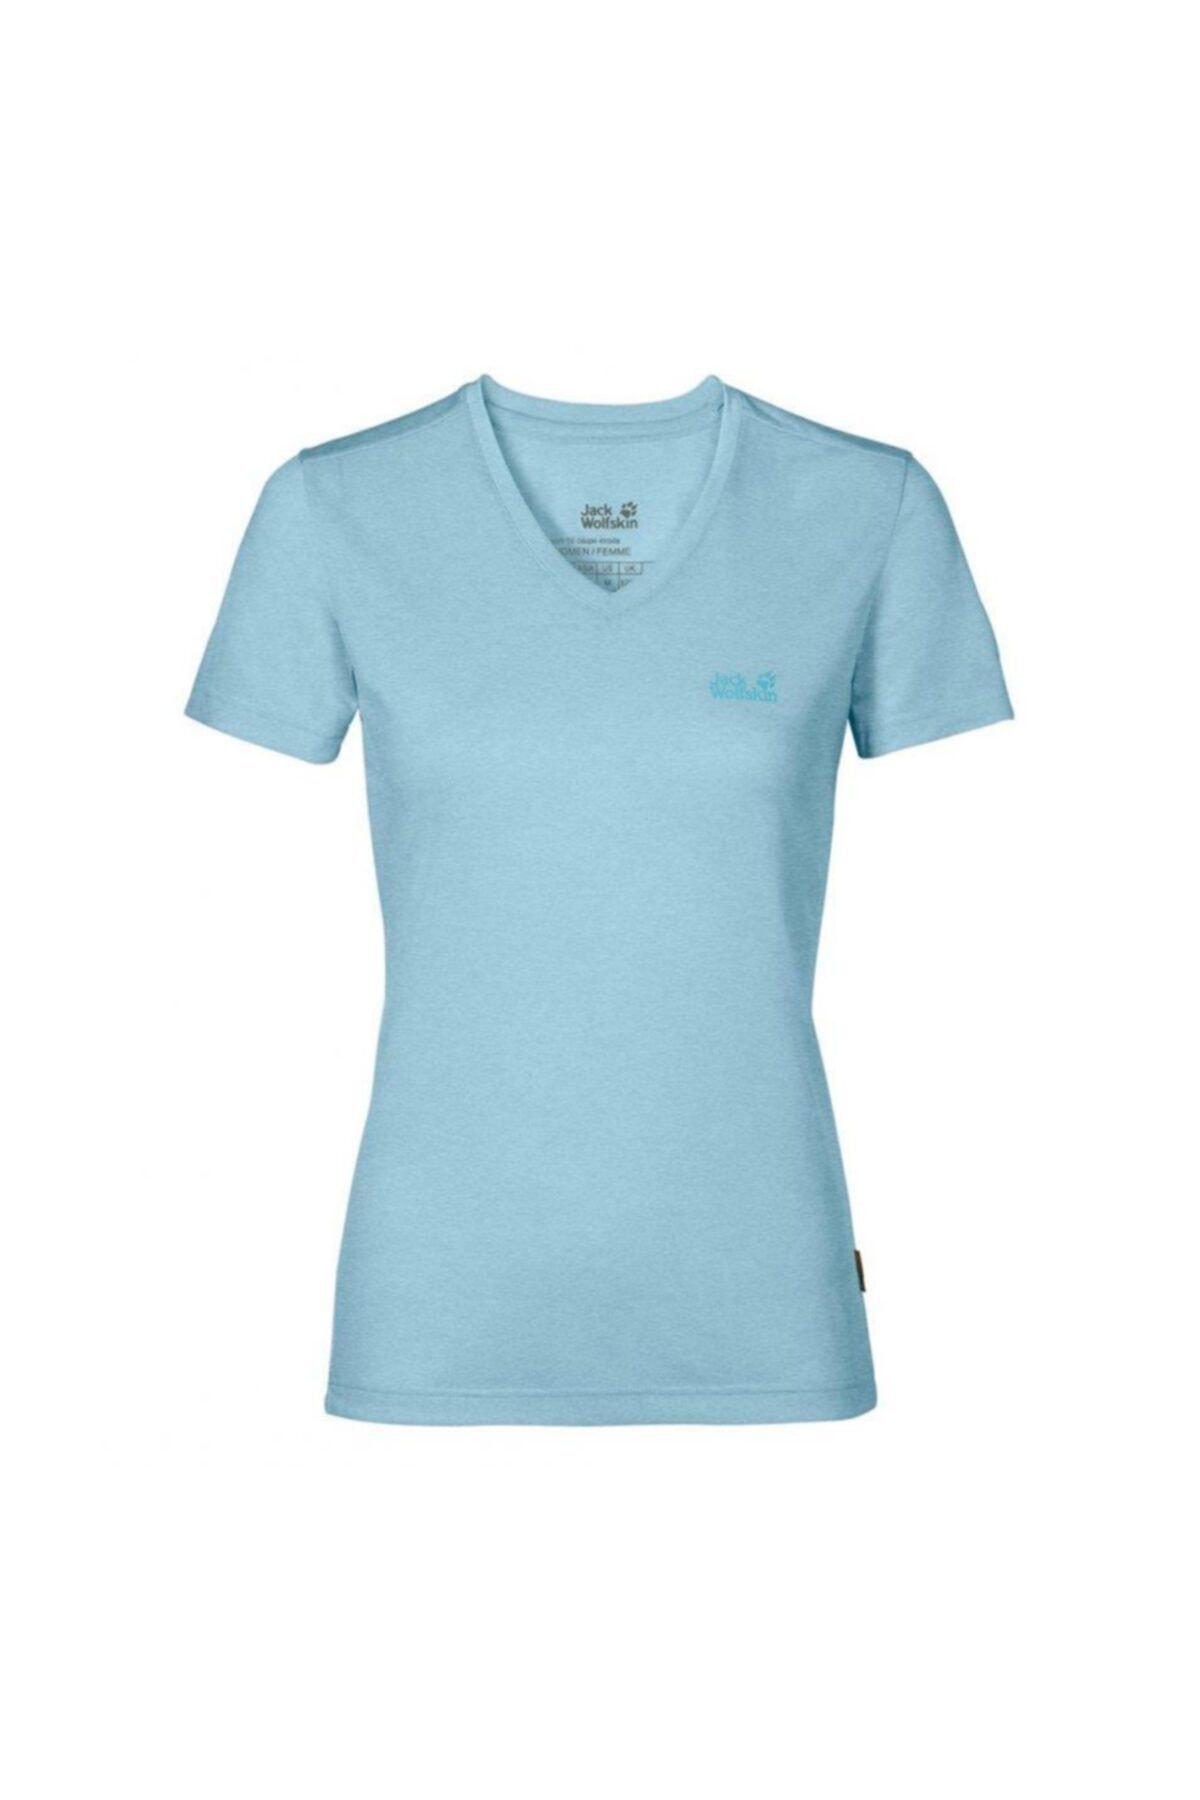 Jack Wolfskin Crosstrail Kadın T-shirt - 1801692-1145 1